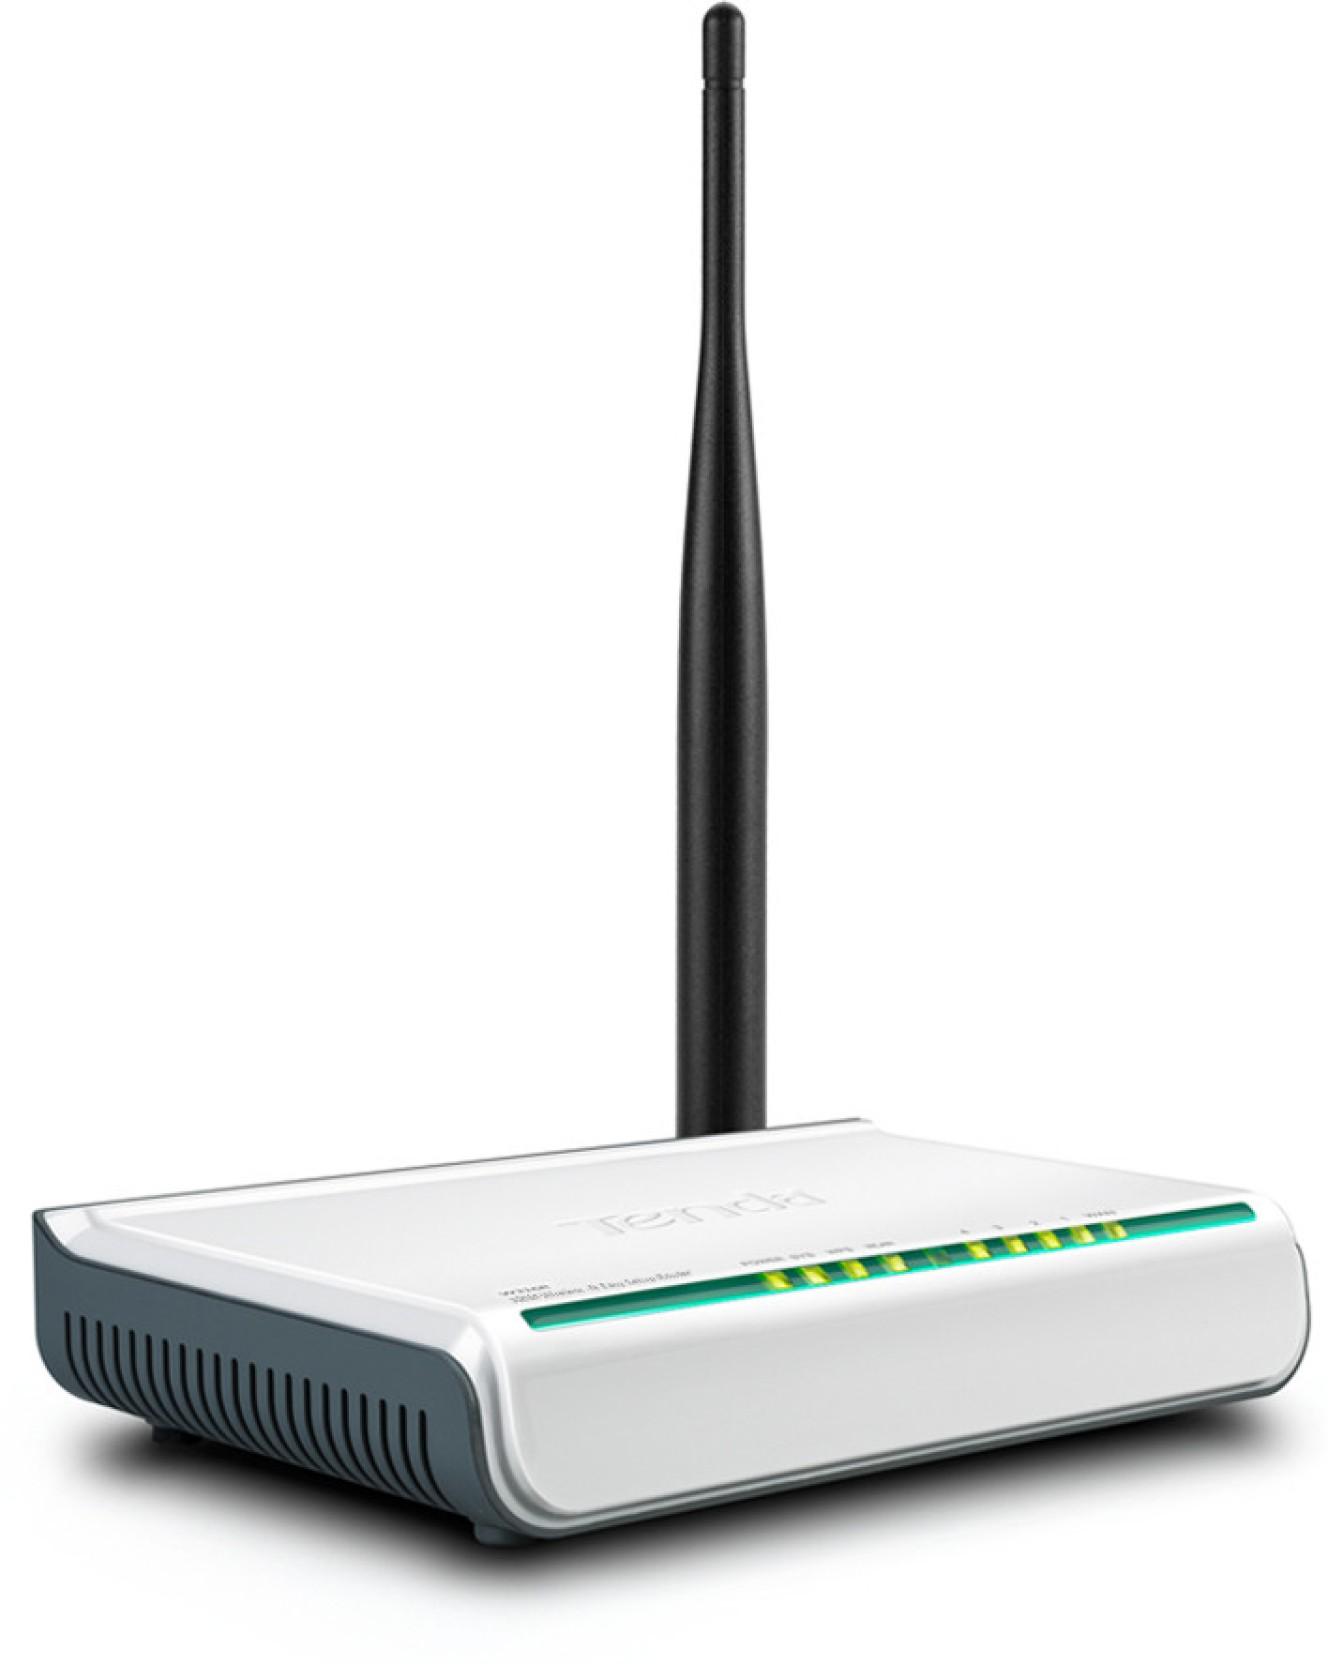 Tenda W316r Router Wireless Usb Adapter Add To Cart